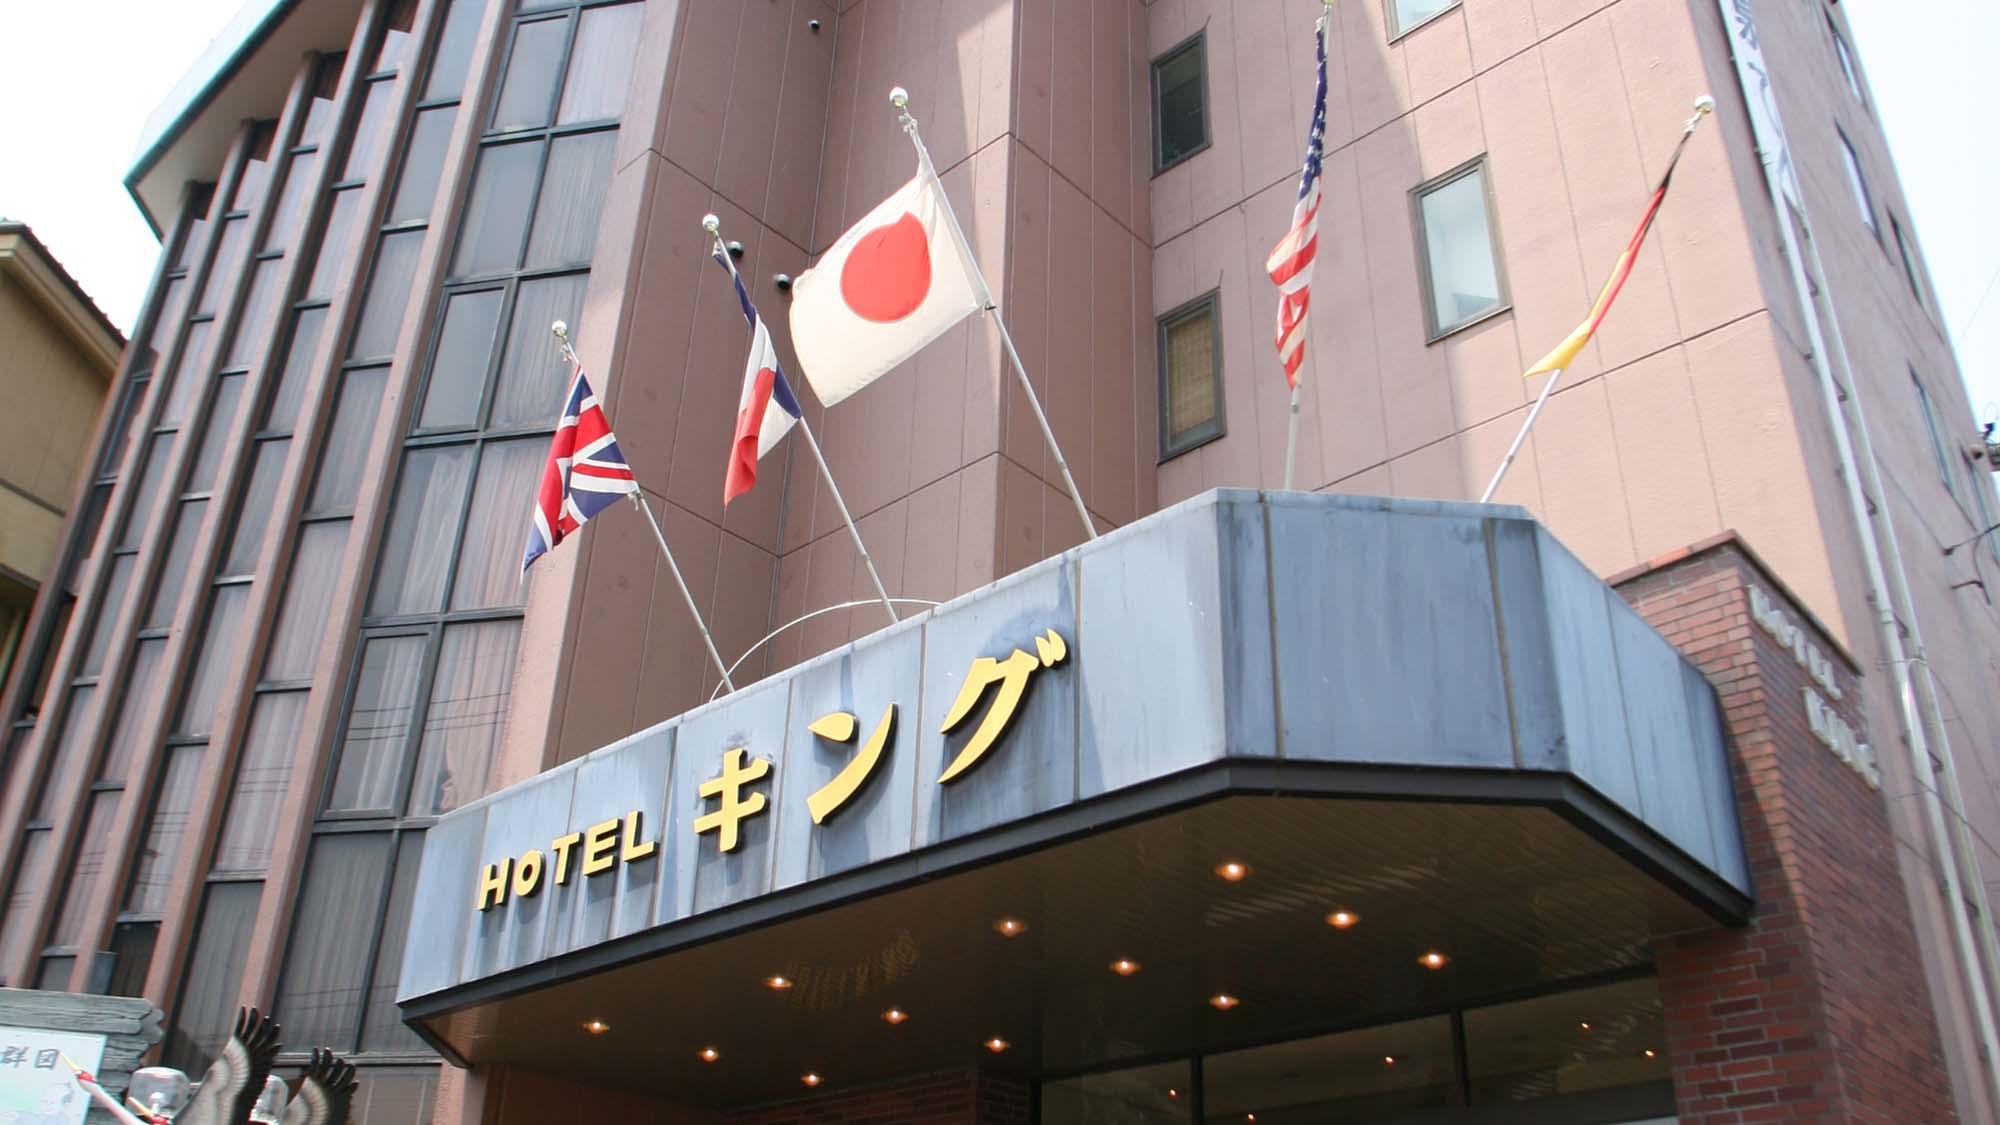 出水唯一の露天風呂付天然温泉の宿 HOTEL KING<鹿児島県>